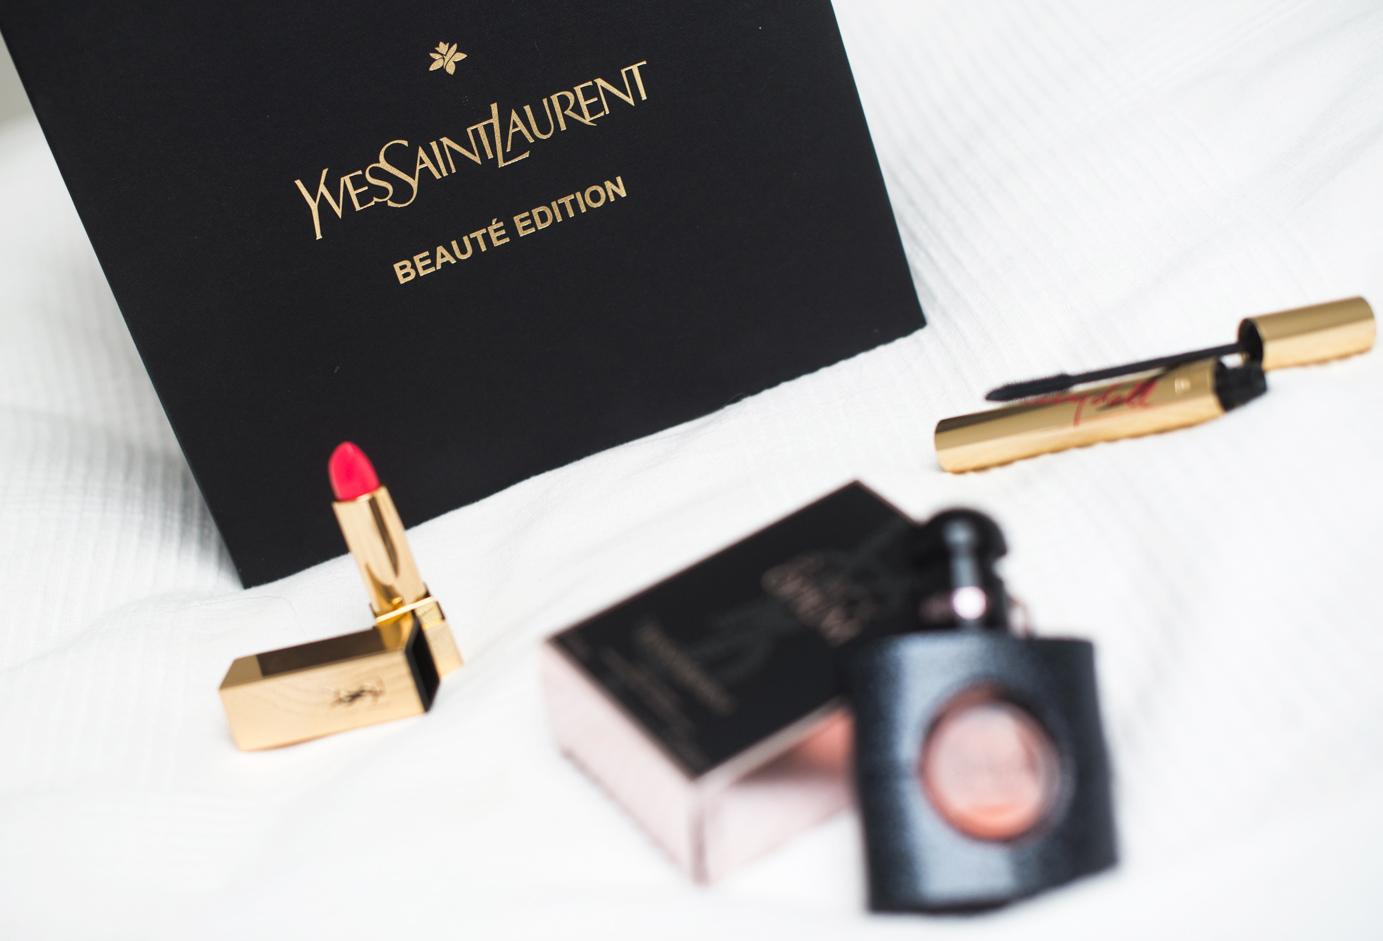 kiamisu_modeblog_flaconi_geschenkbox_ysl_yves-saint-laurent_flaconi-box_lancome-hypnose_review_erfahrung-20